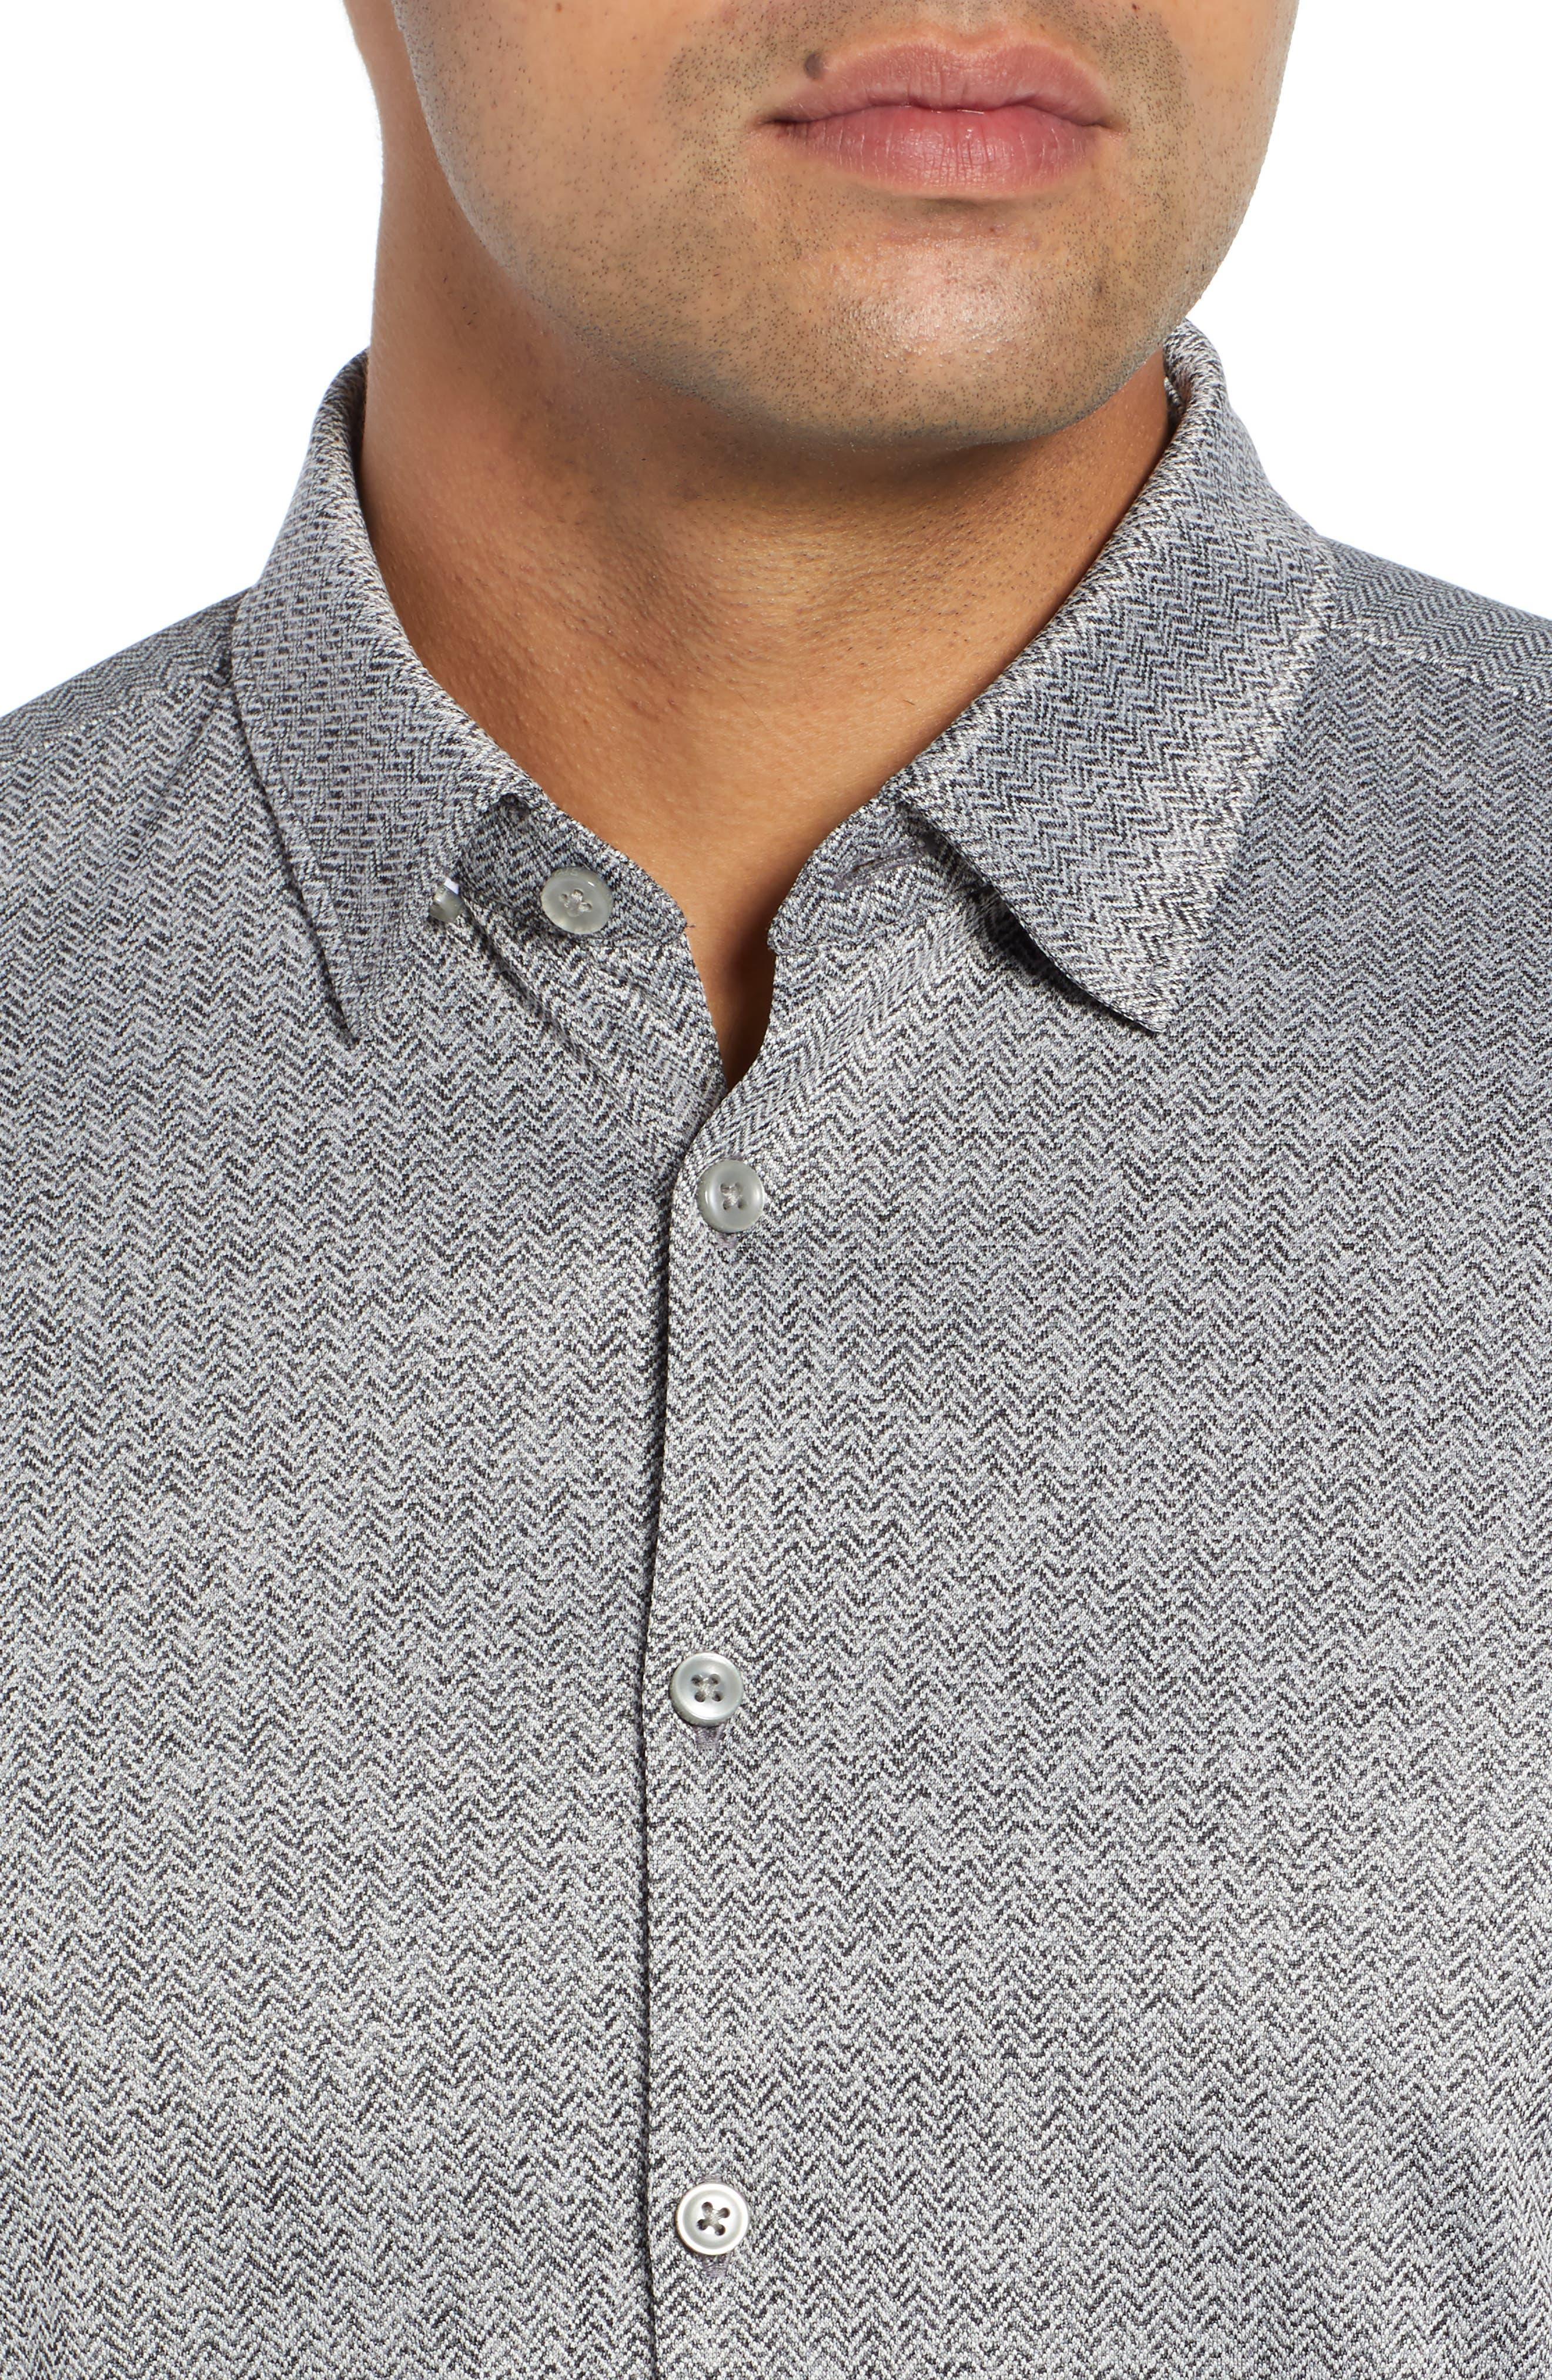 Trim Fit Knit Sport Shirt,                             Alternate thumbnail 2, color,                             BLACK